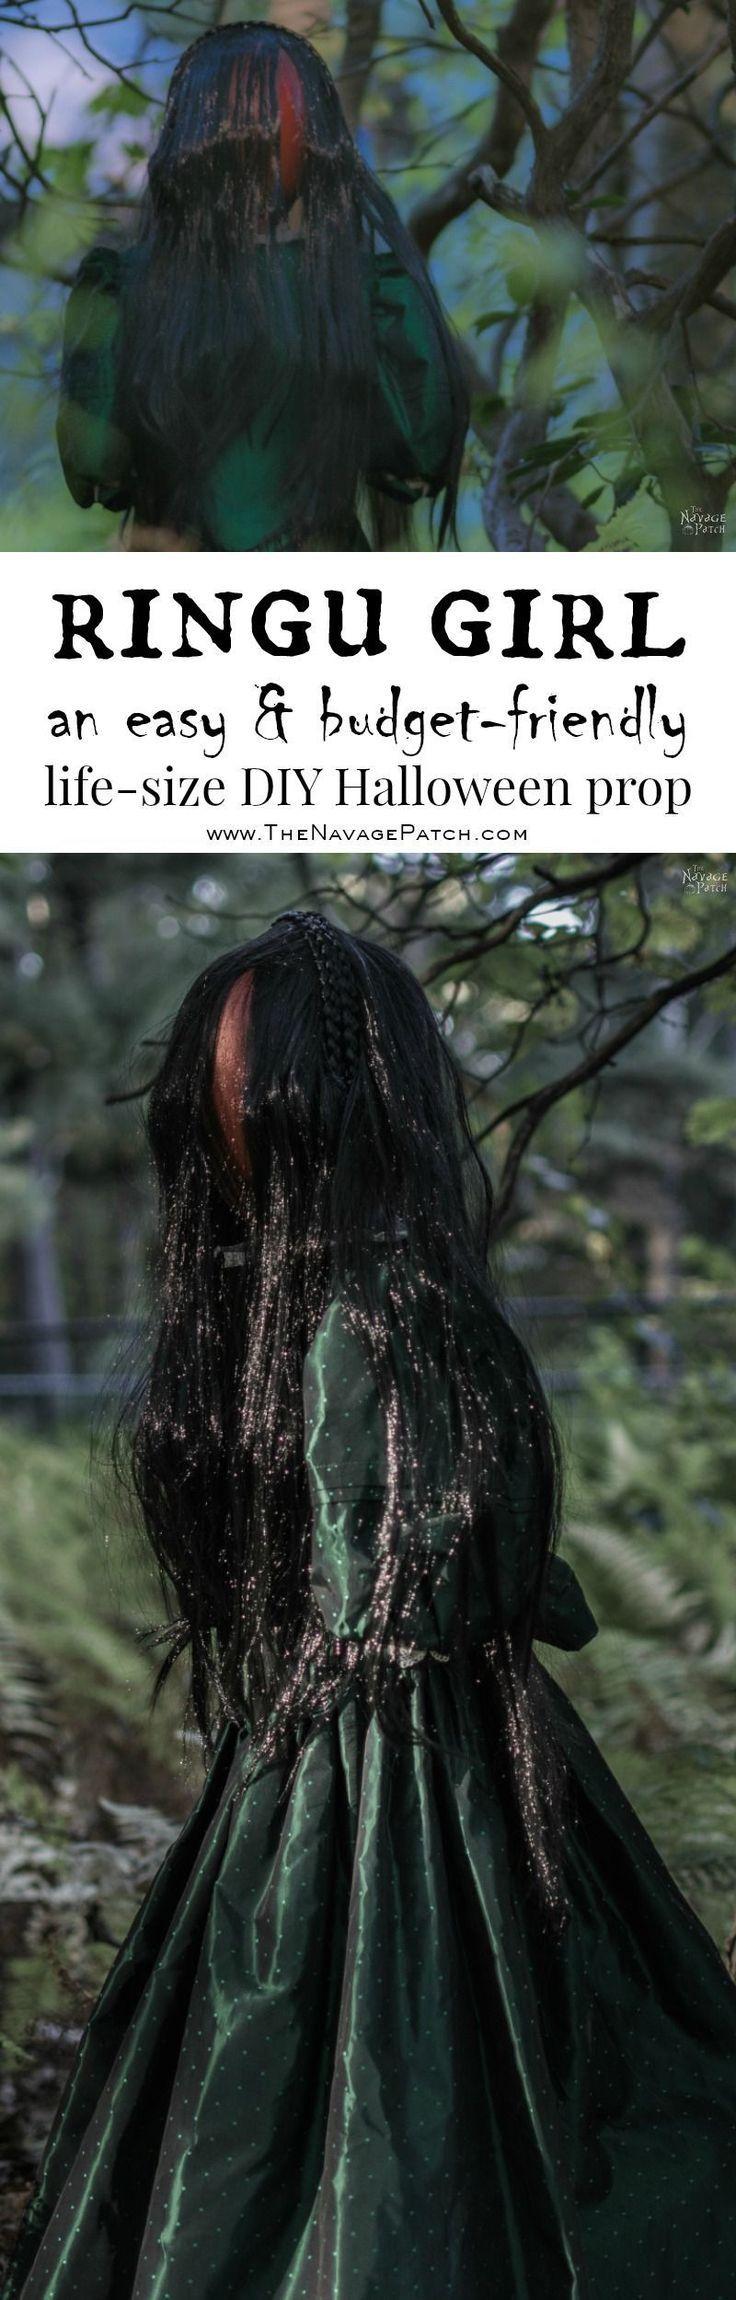 Ringu Girl {a Life-size Halloween Prop Creepy halloween props - diy halloween decorations scary